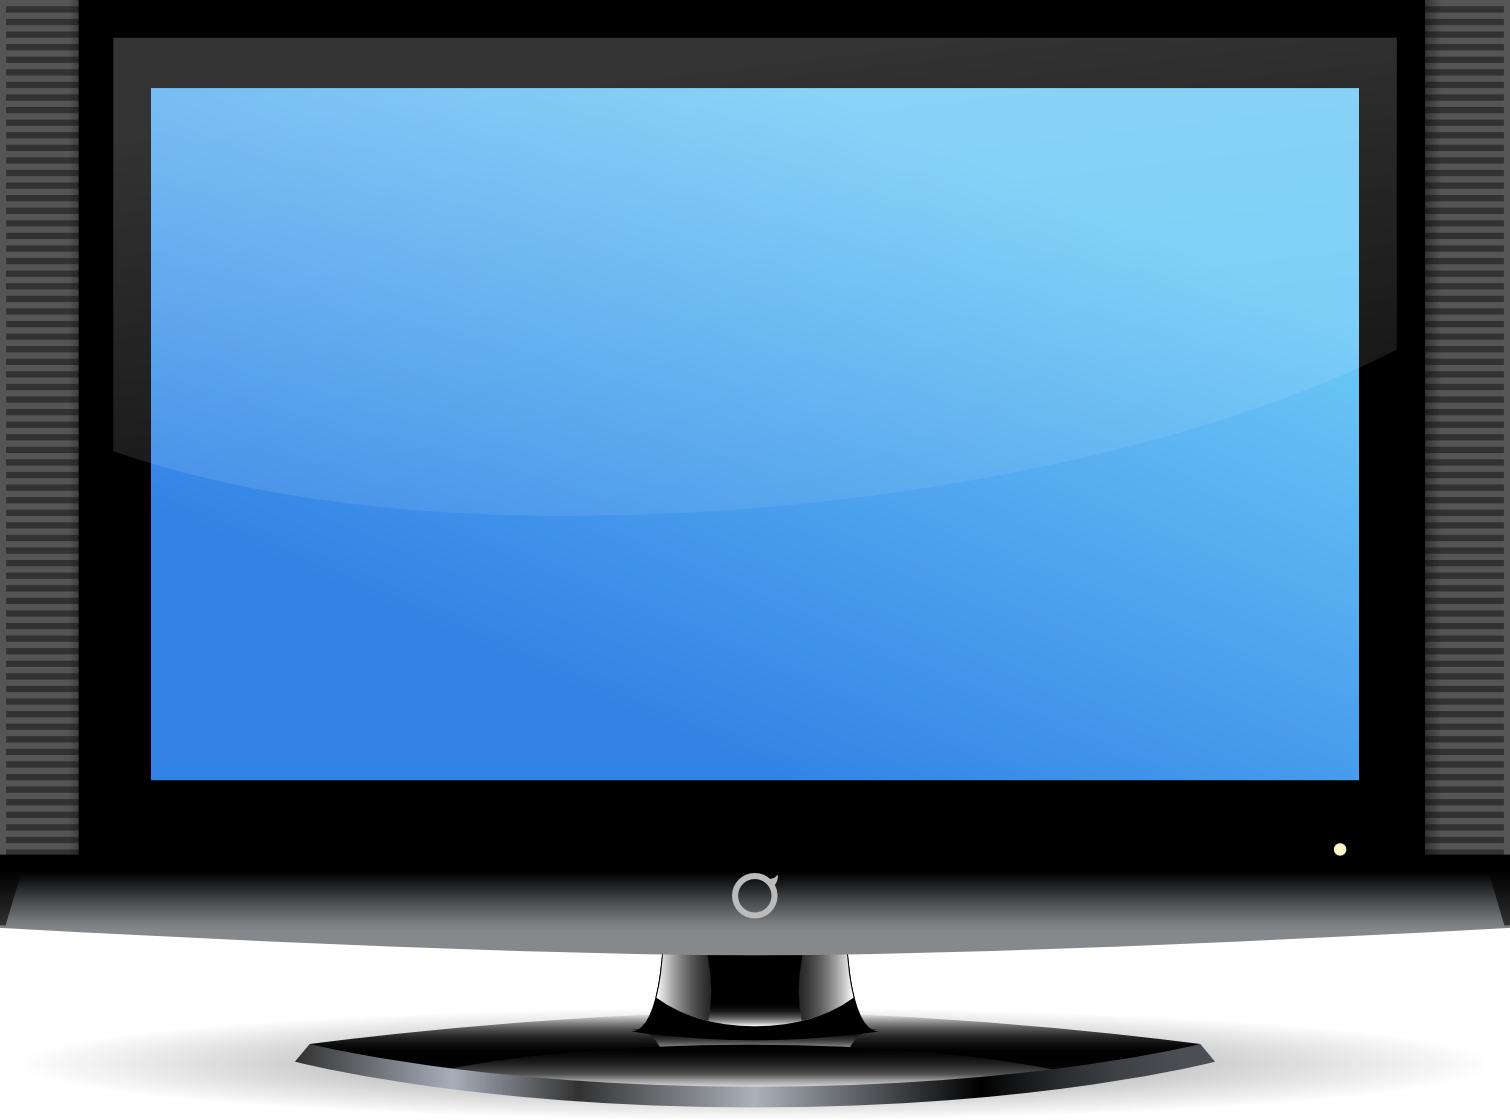 службы картинка с экраном телевизора нефрита, каталог